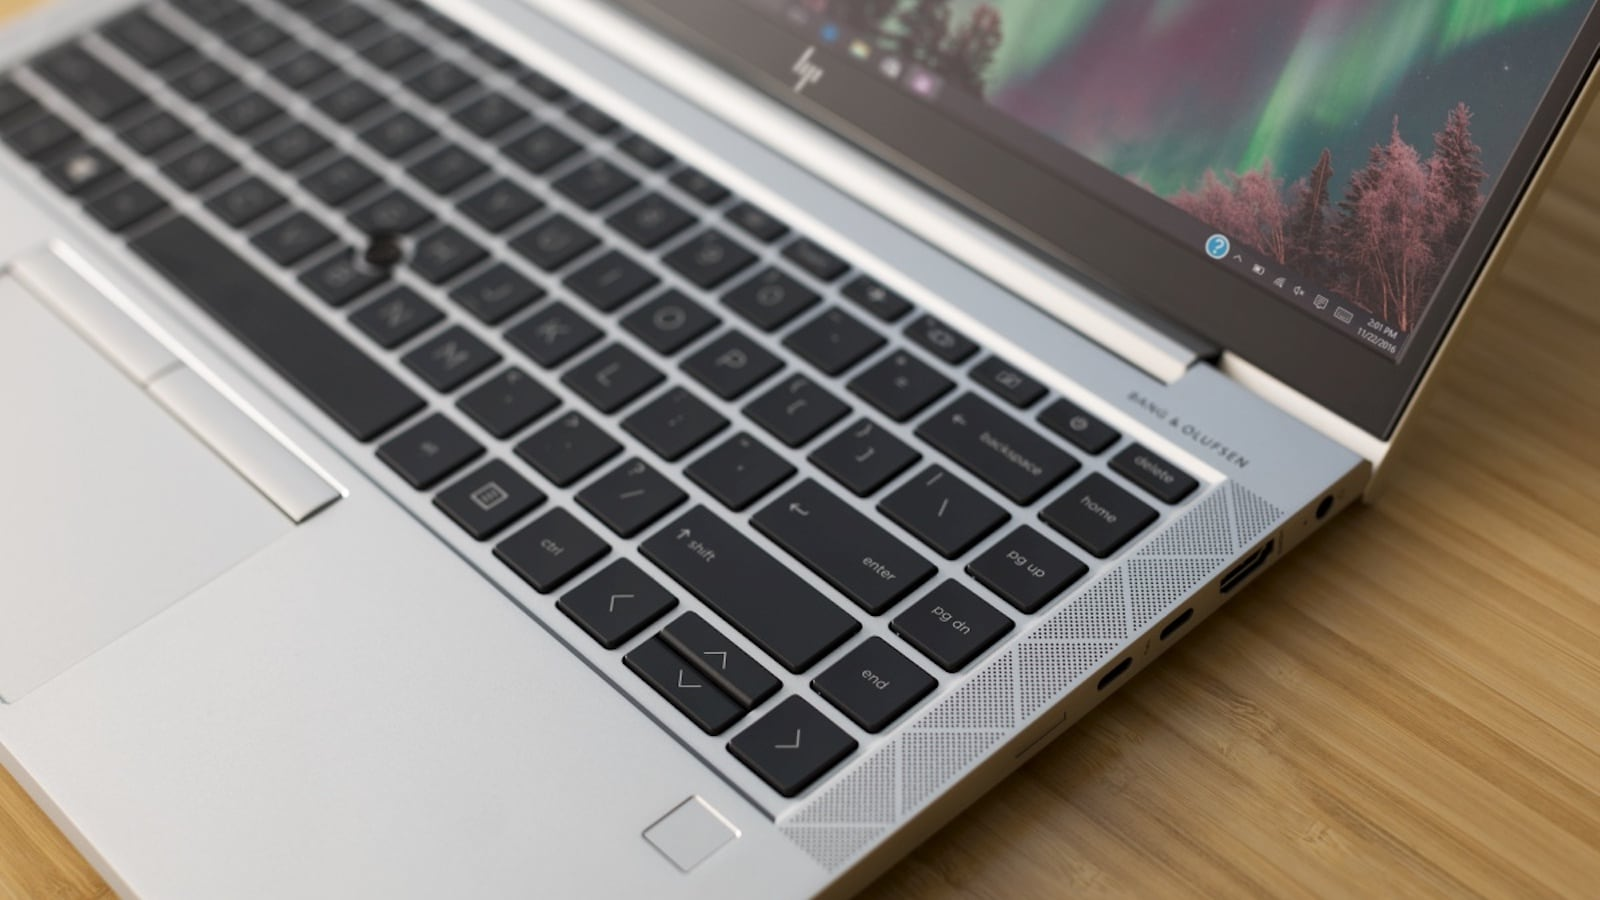 HP EliteBook 800 G7 Series Ultra-Slim Laptops boast enterprise-level security